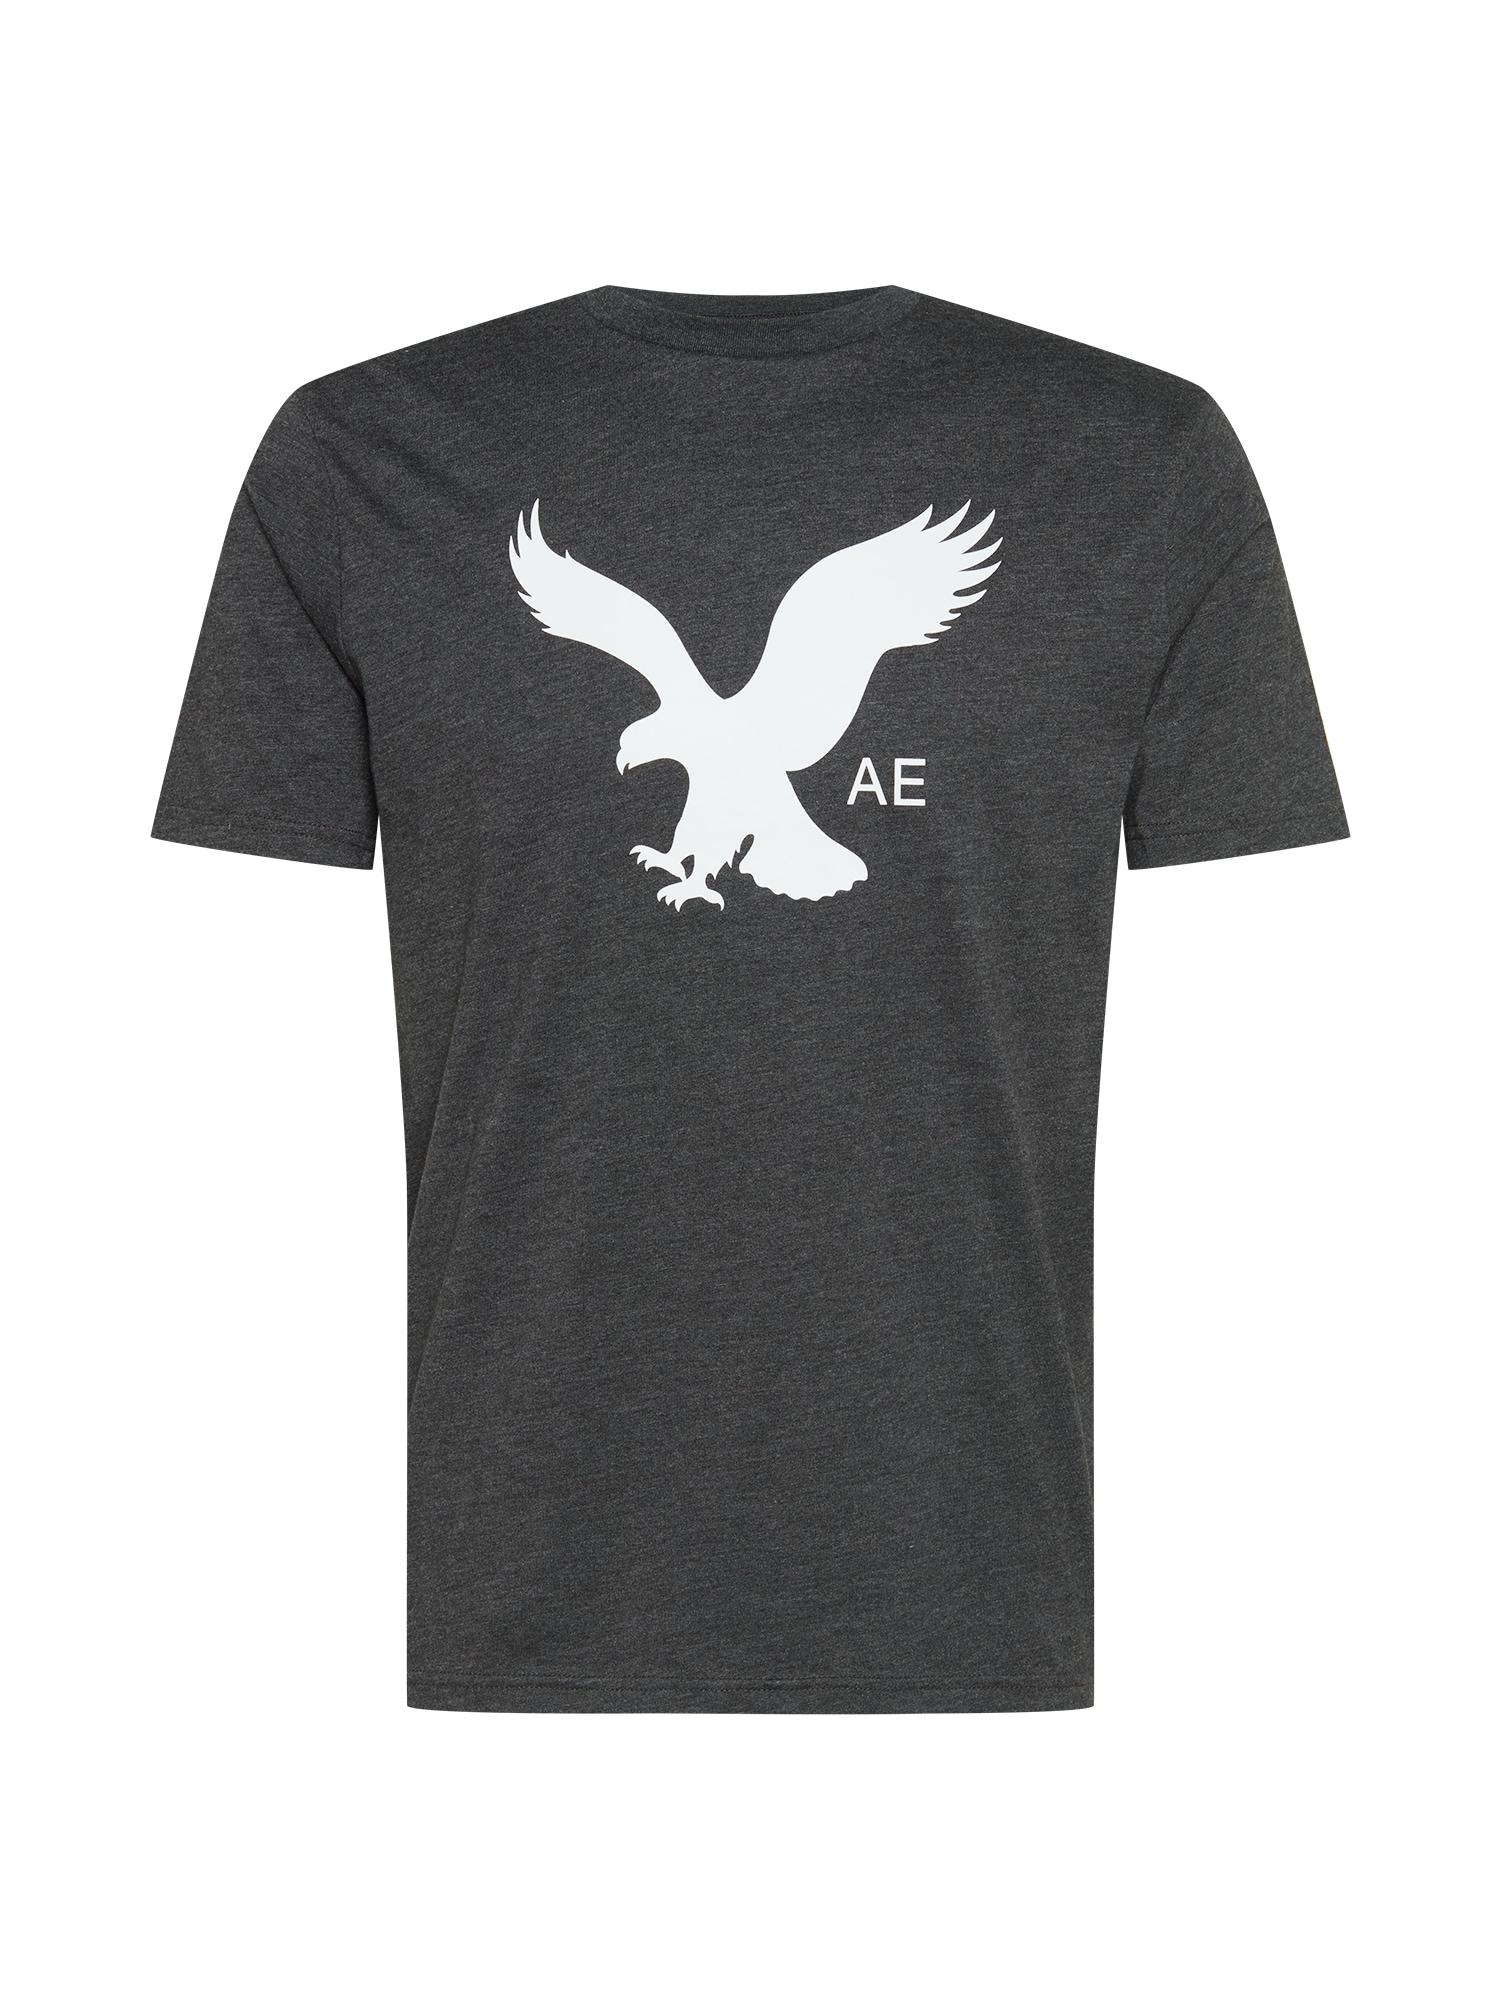 American Eagle Marškinėliai 'SINGLE DYE' tamsiai pilka / balta